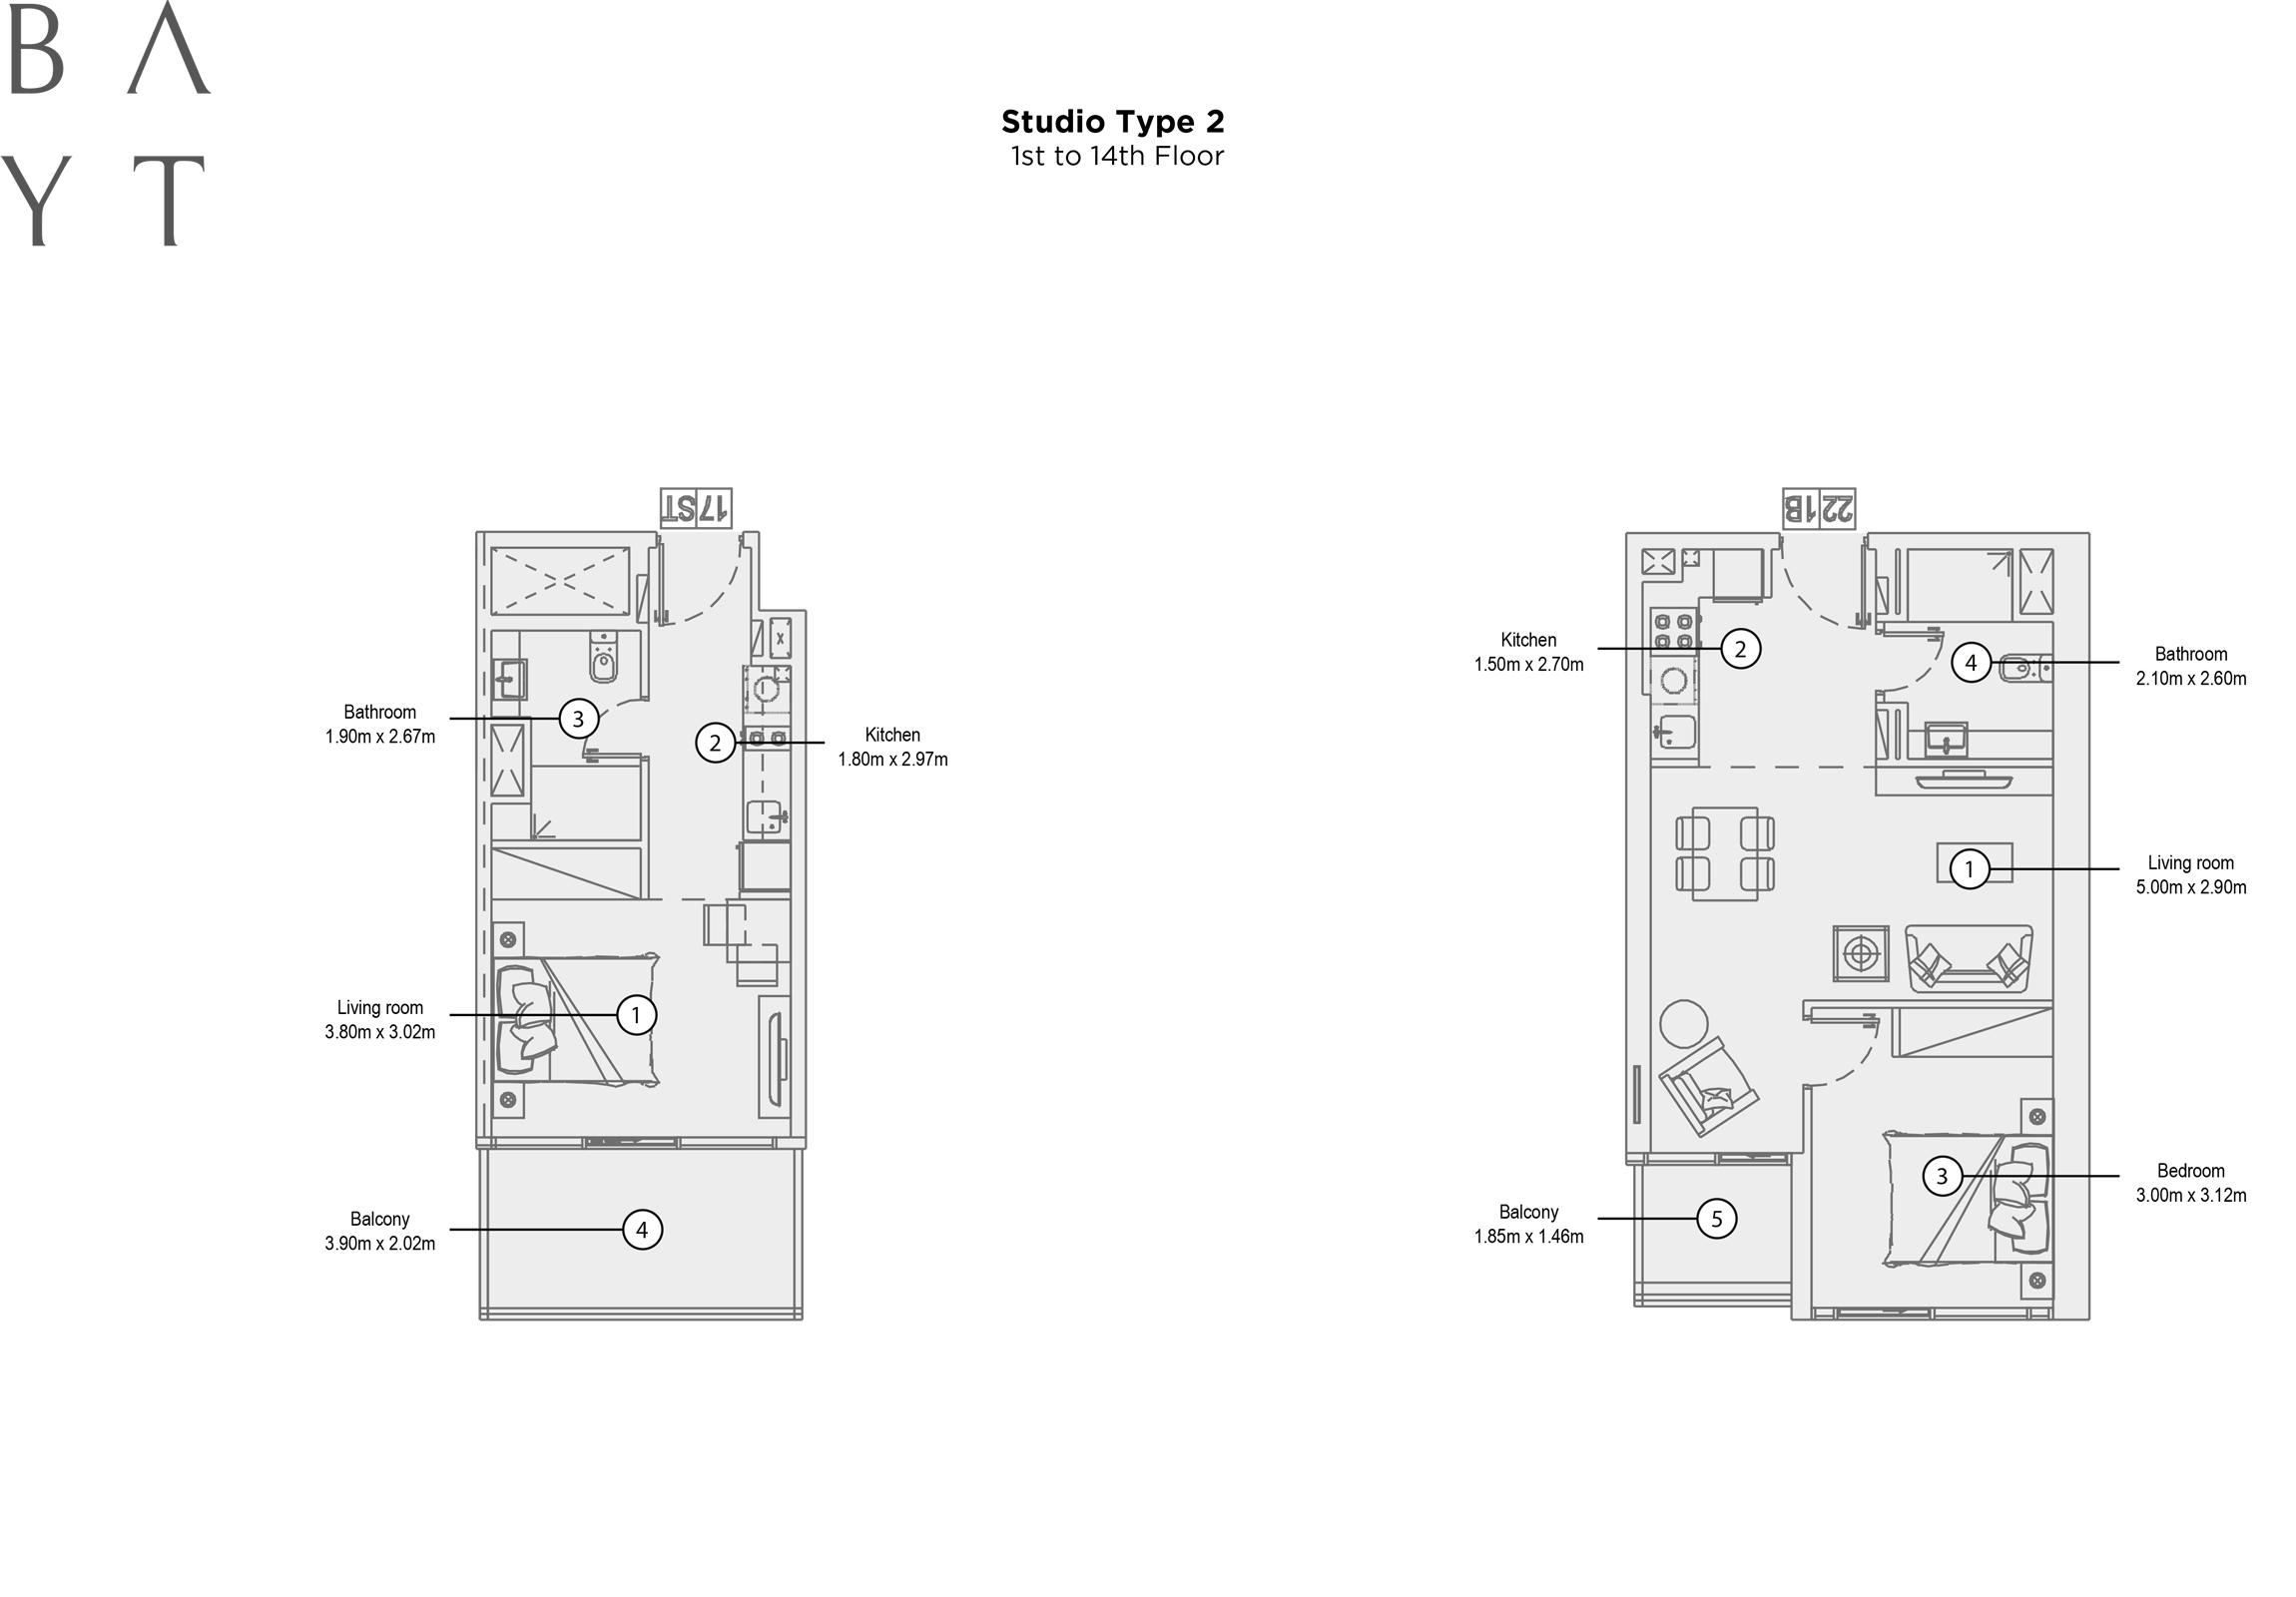 Studio Type 2, 1st to 14th Floor